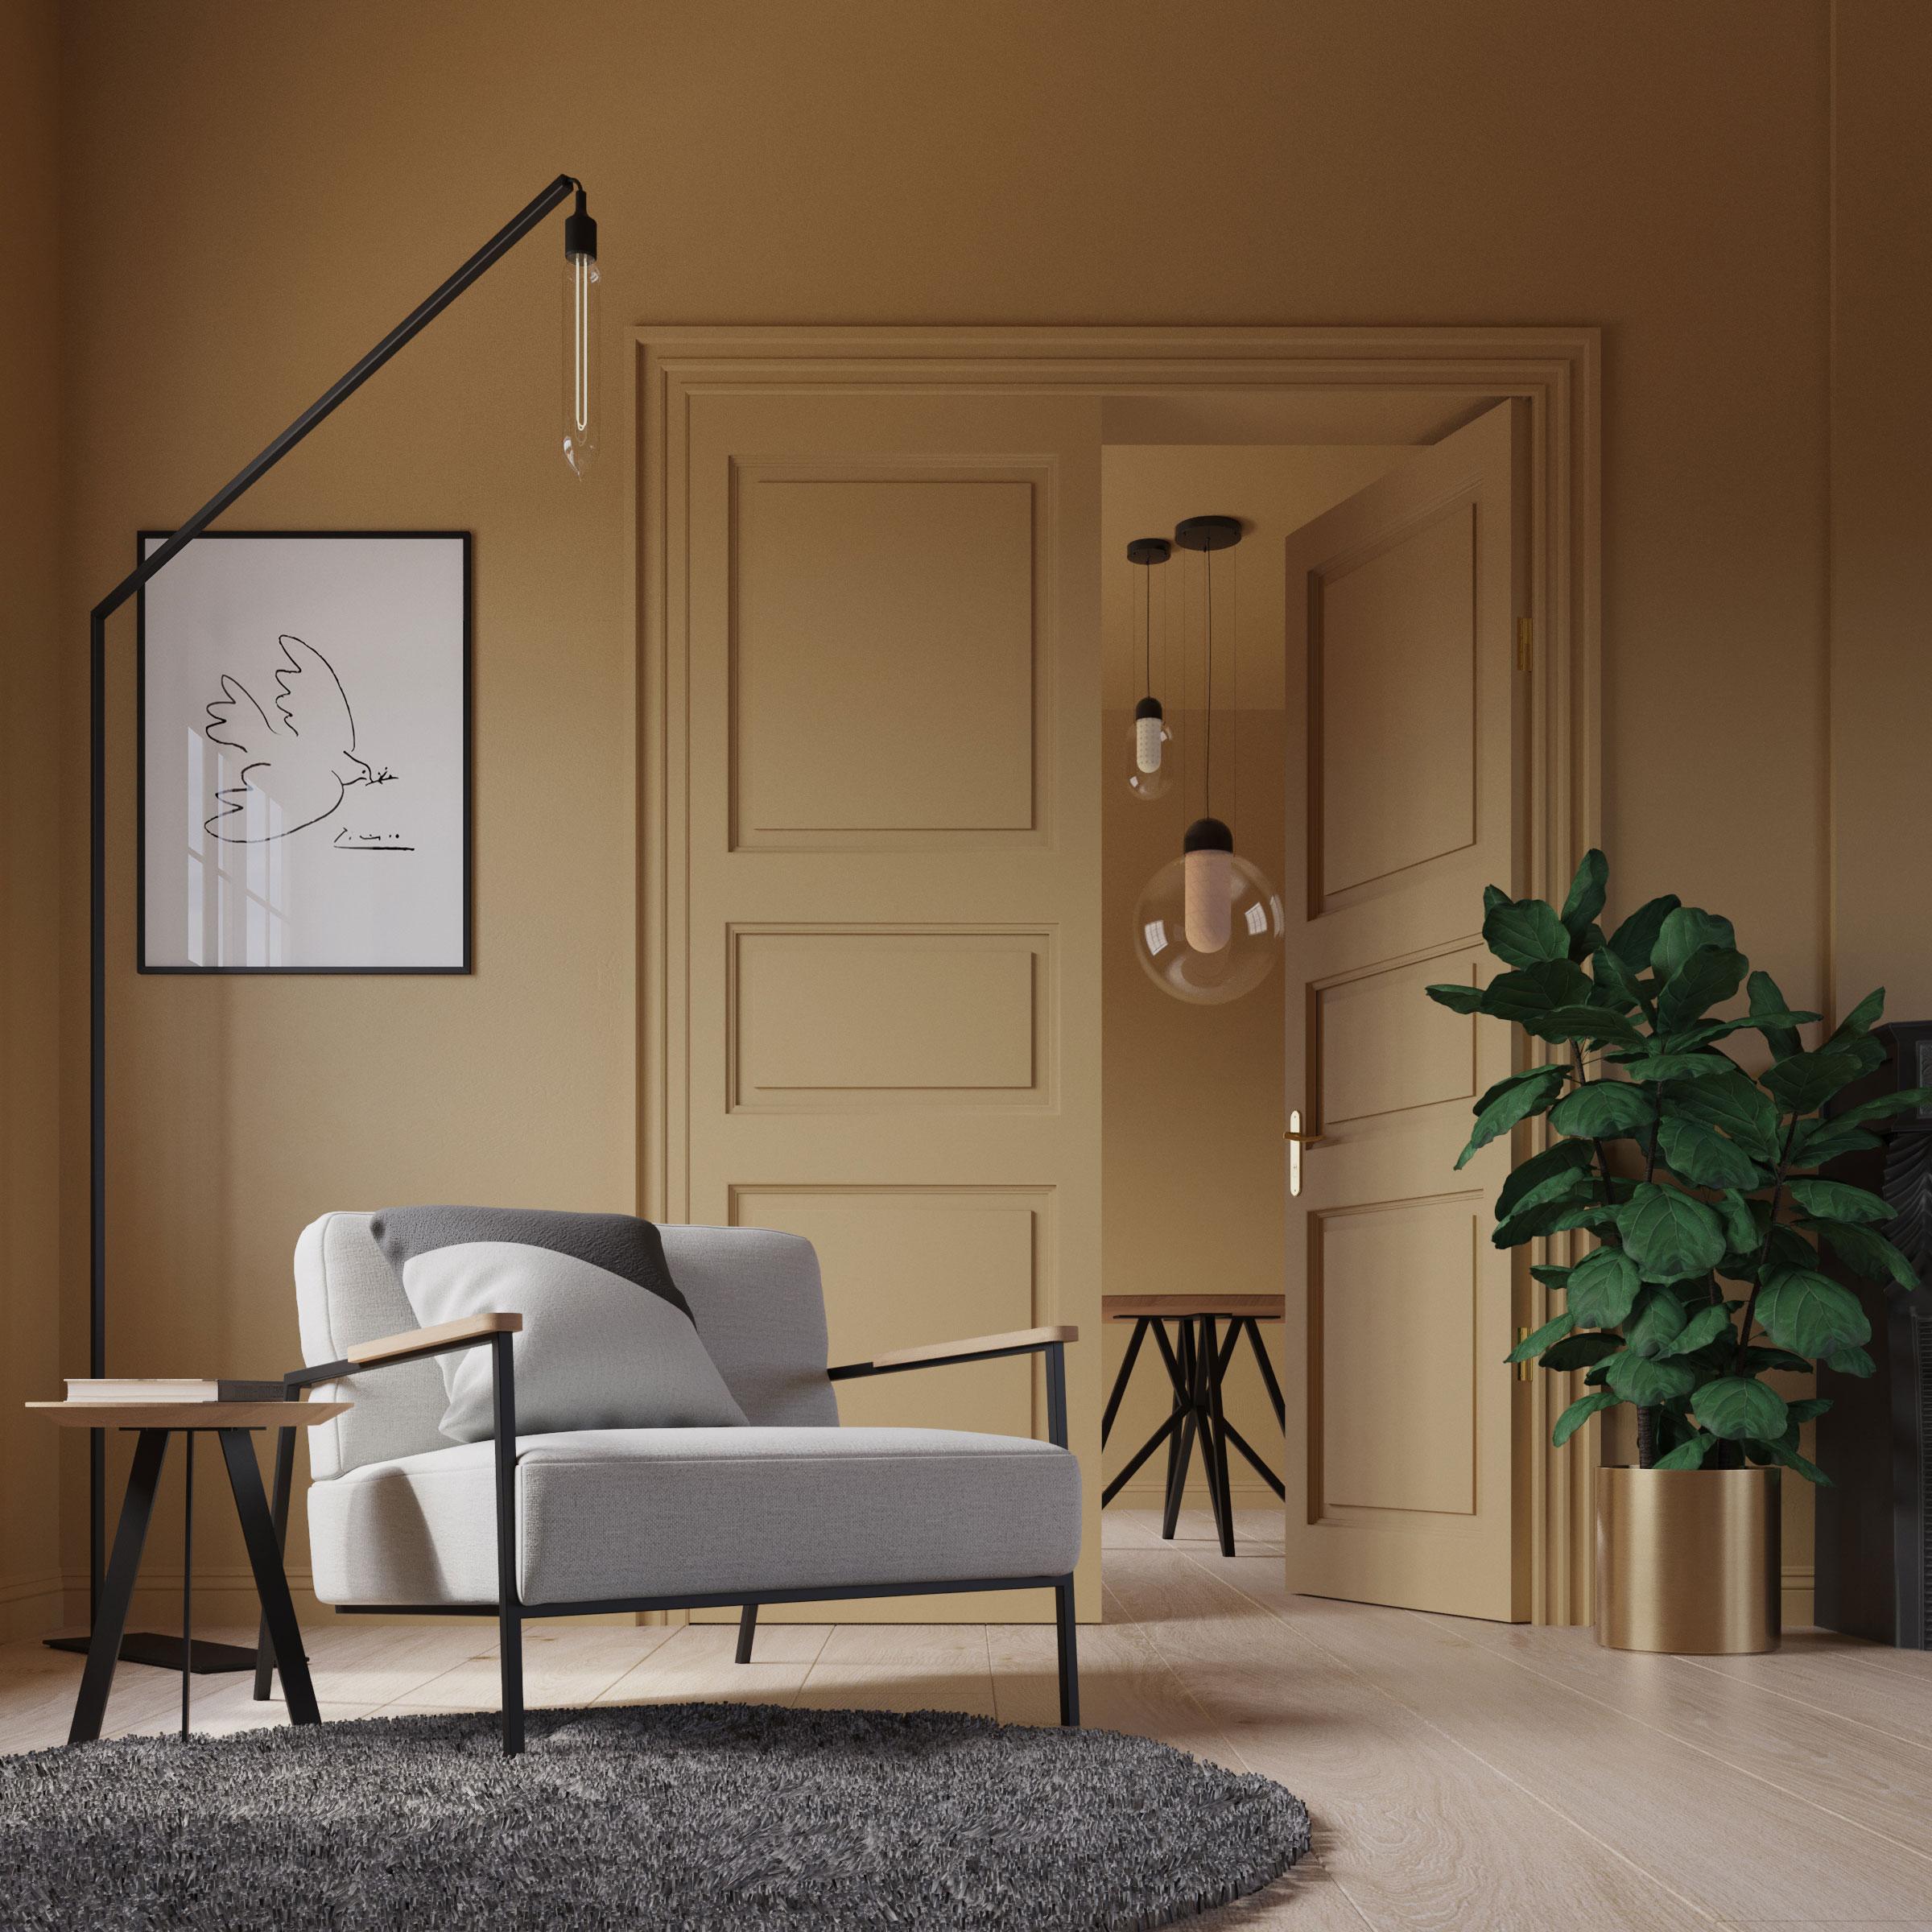 detailslider_setting_co_designloungechair_black_naturelhardwaxoil_kvadrathallingdal65_110_fauteuil